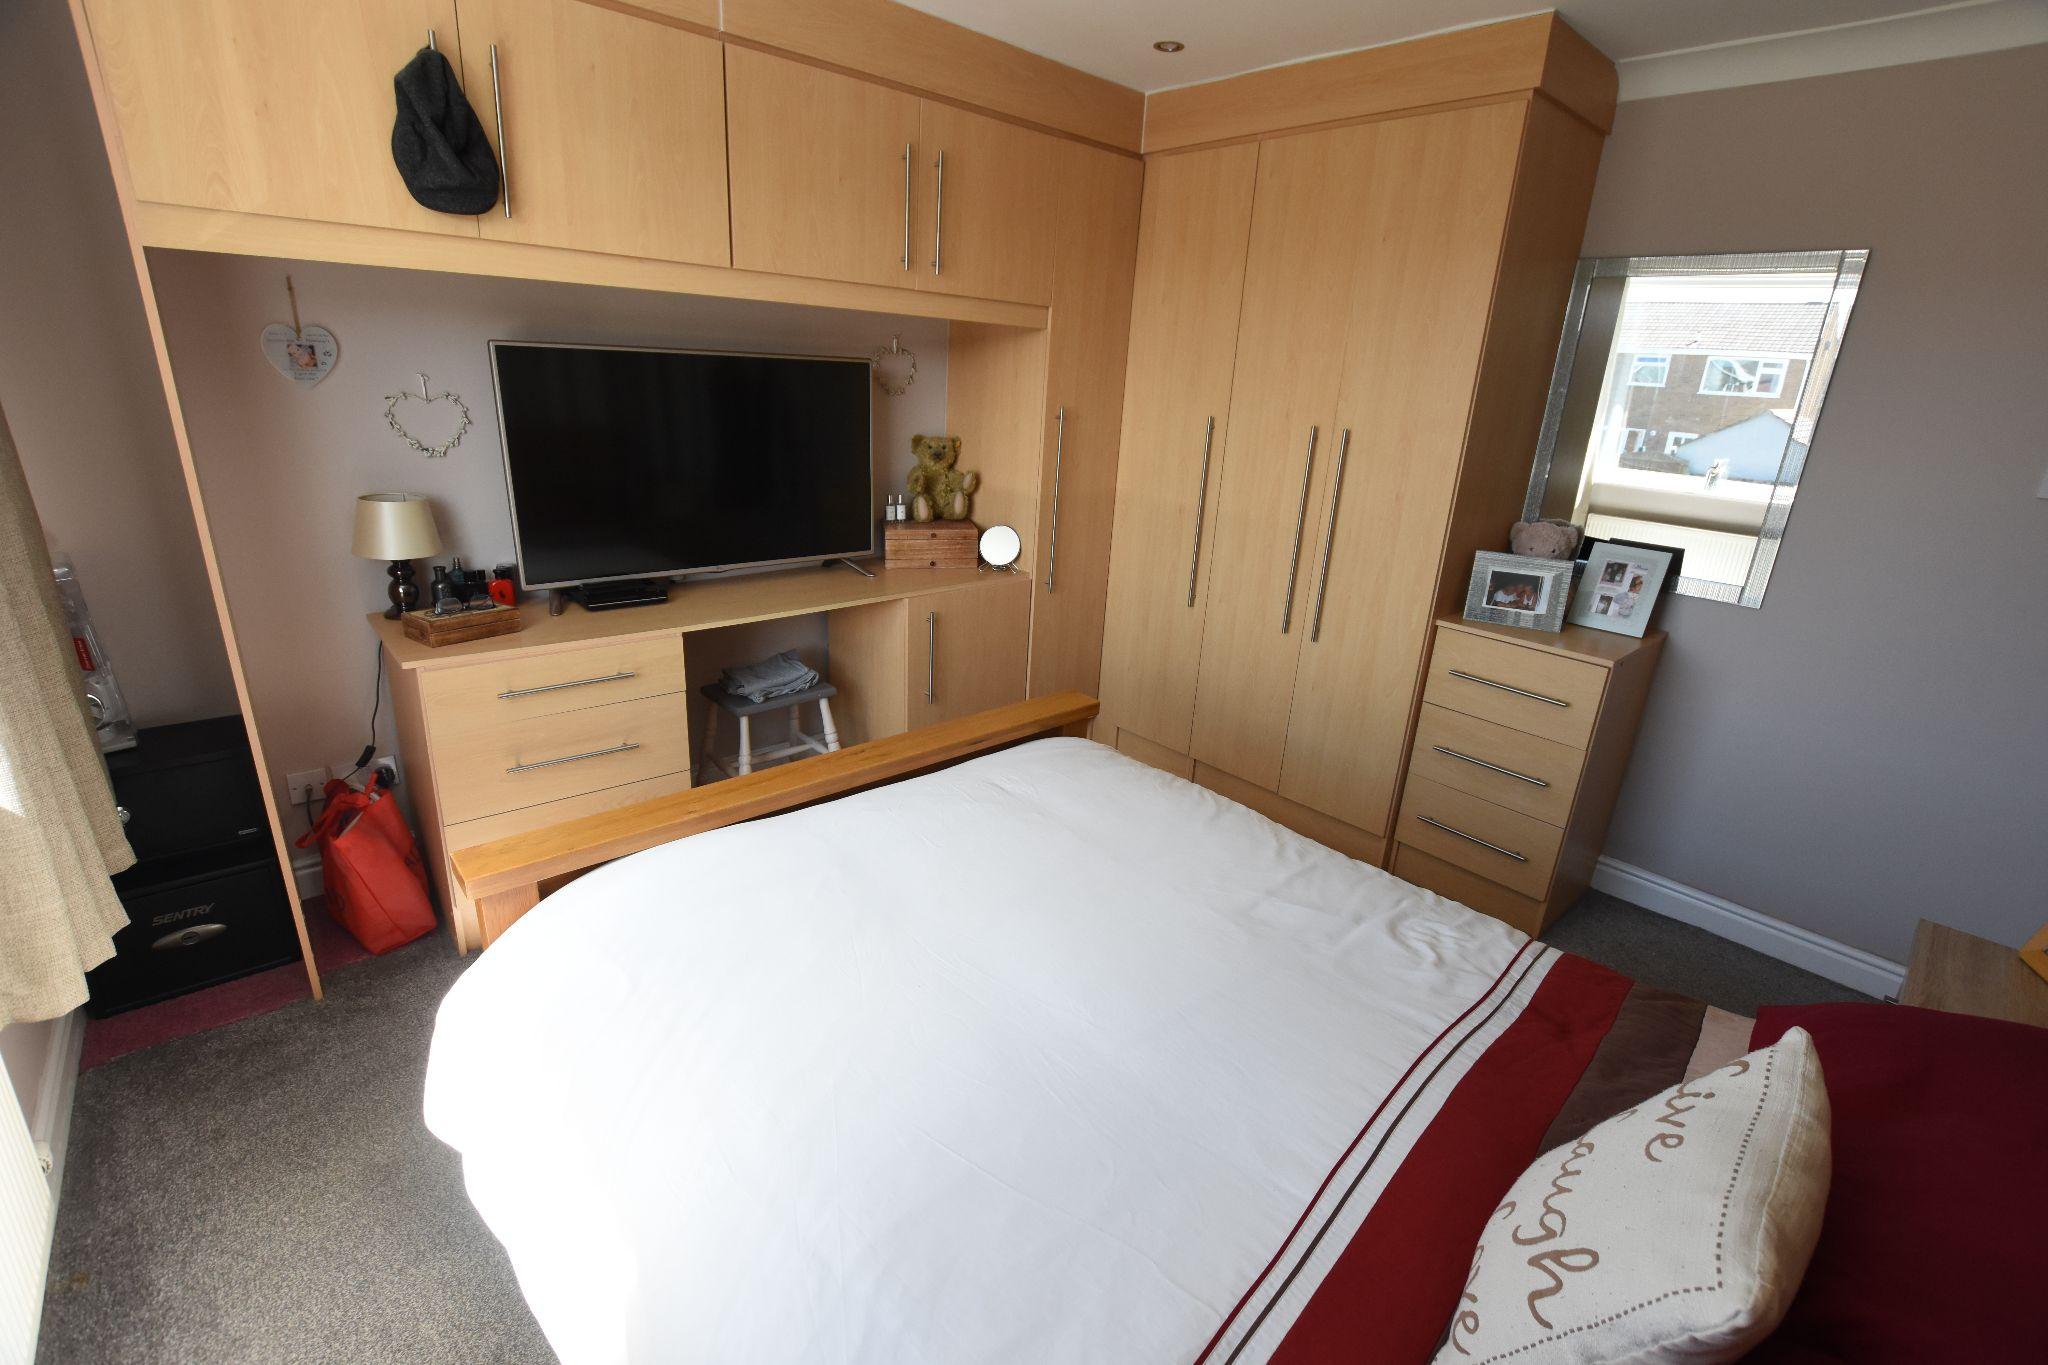 3 bedroom semi-detached house Sold STC in Preston - Bedroom 1